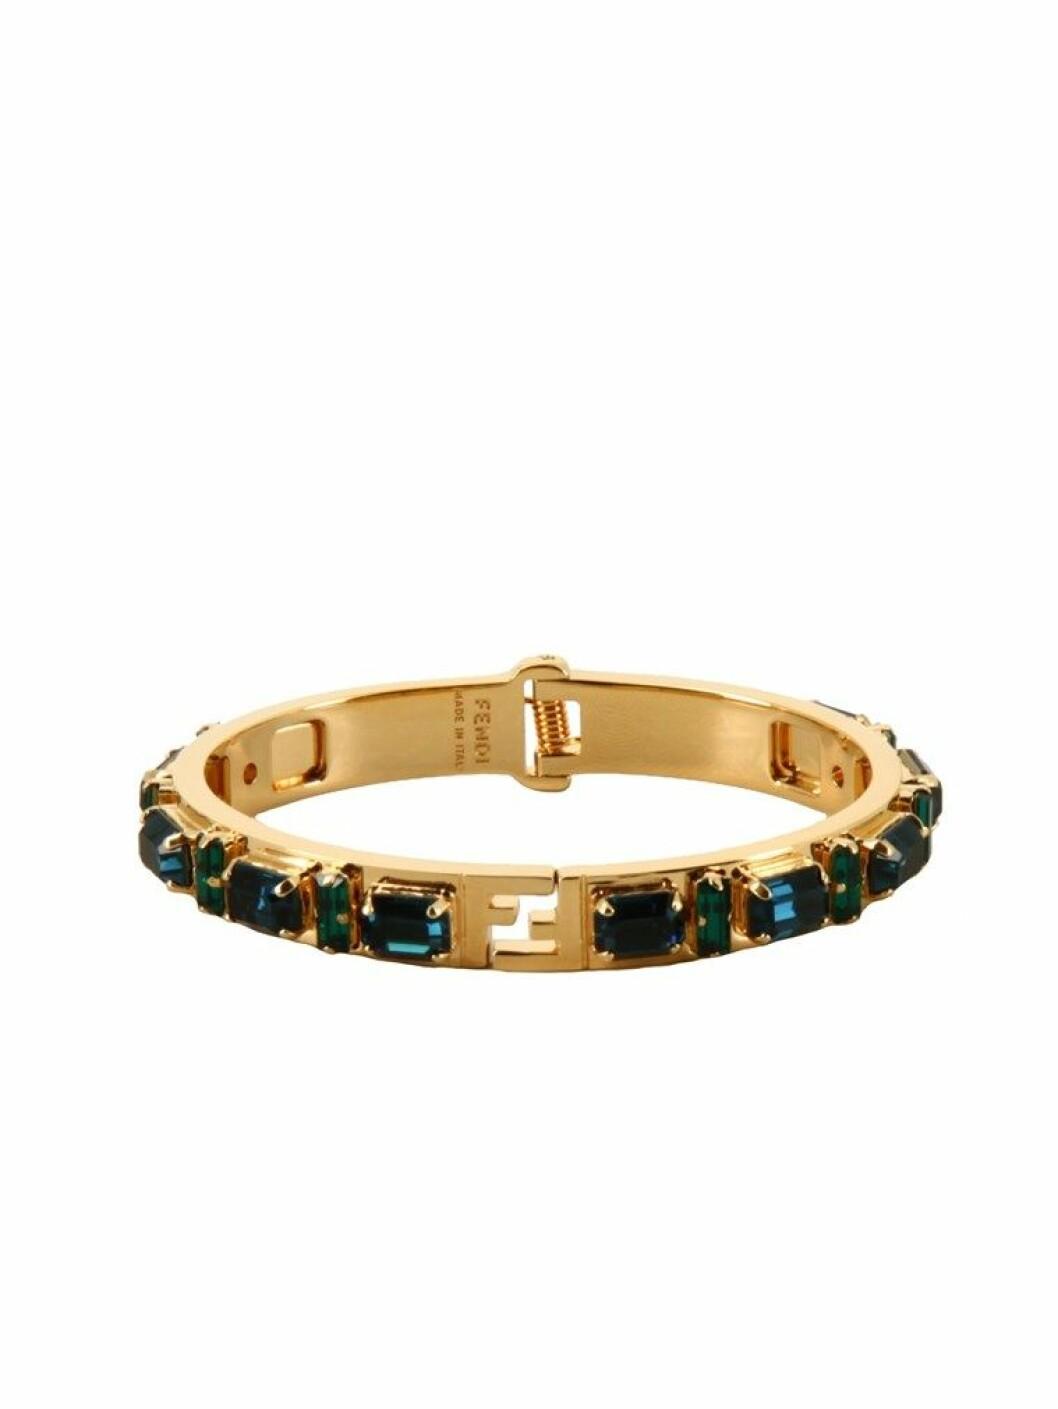 Armband från Fendi